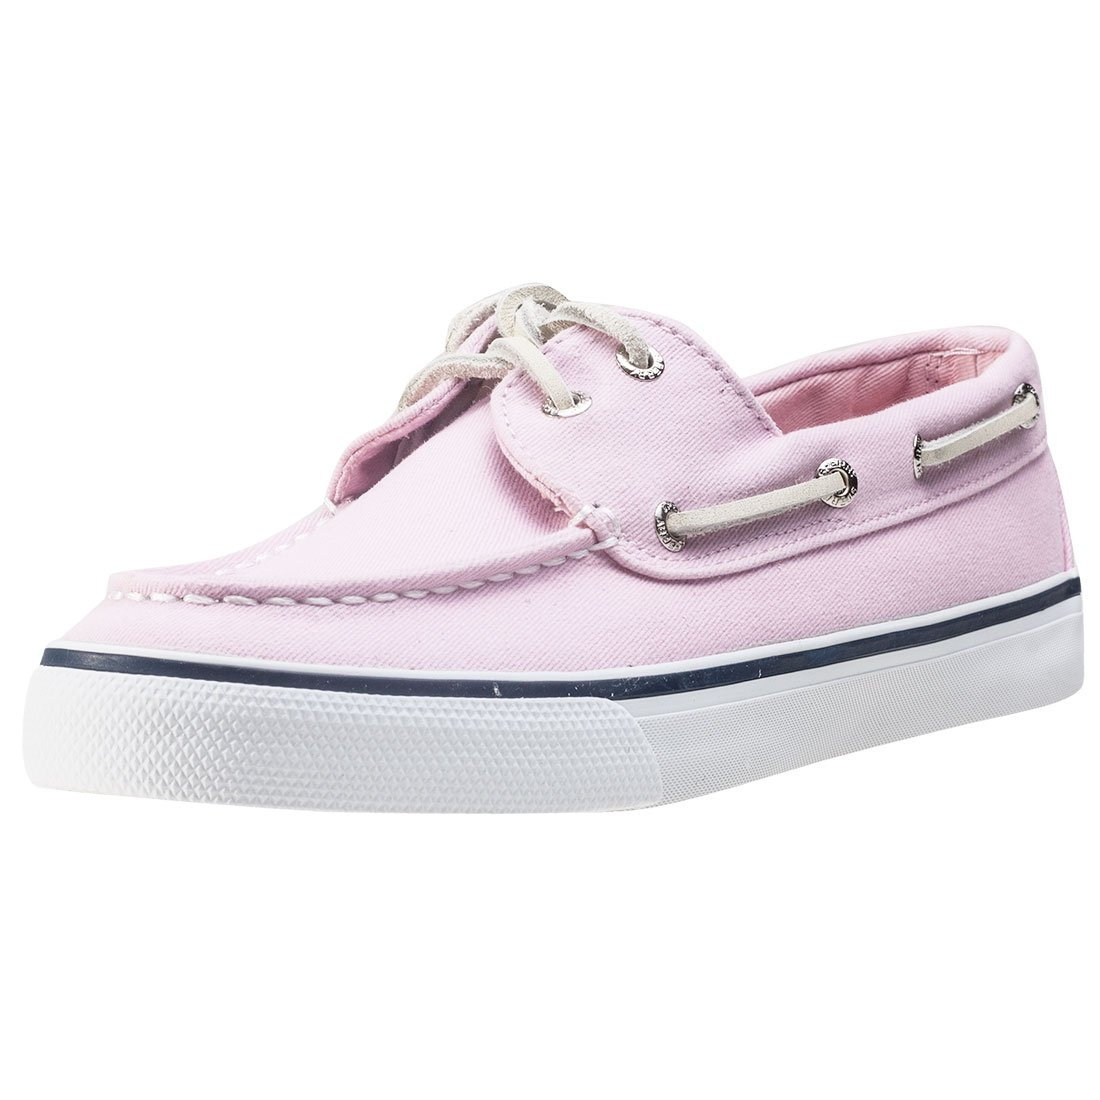 Sperry Top-Sider Women's Bahama Core Fashion Sneaker B008730TZ8 7 M (C) Rose